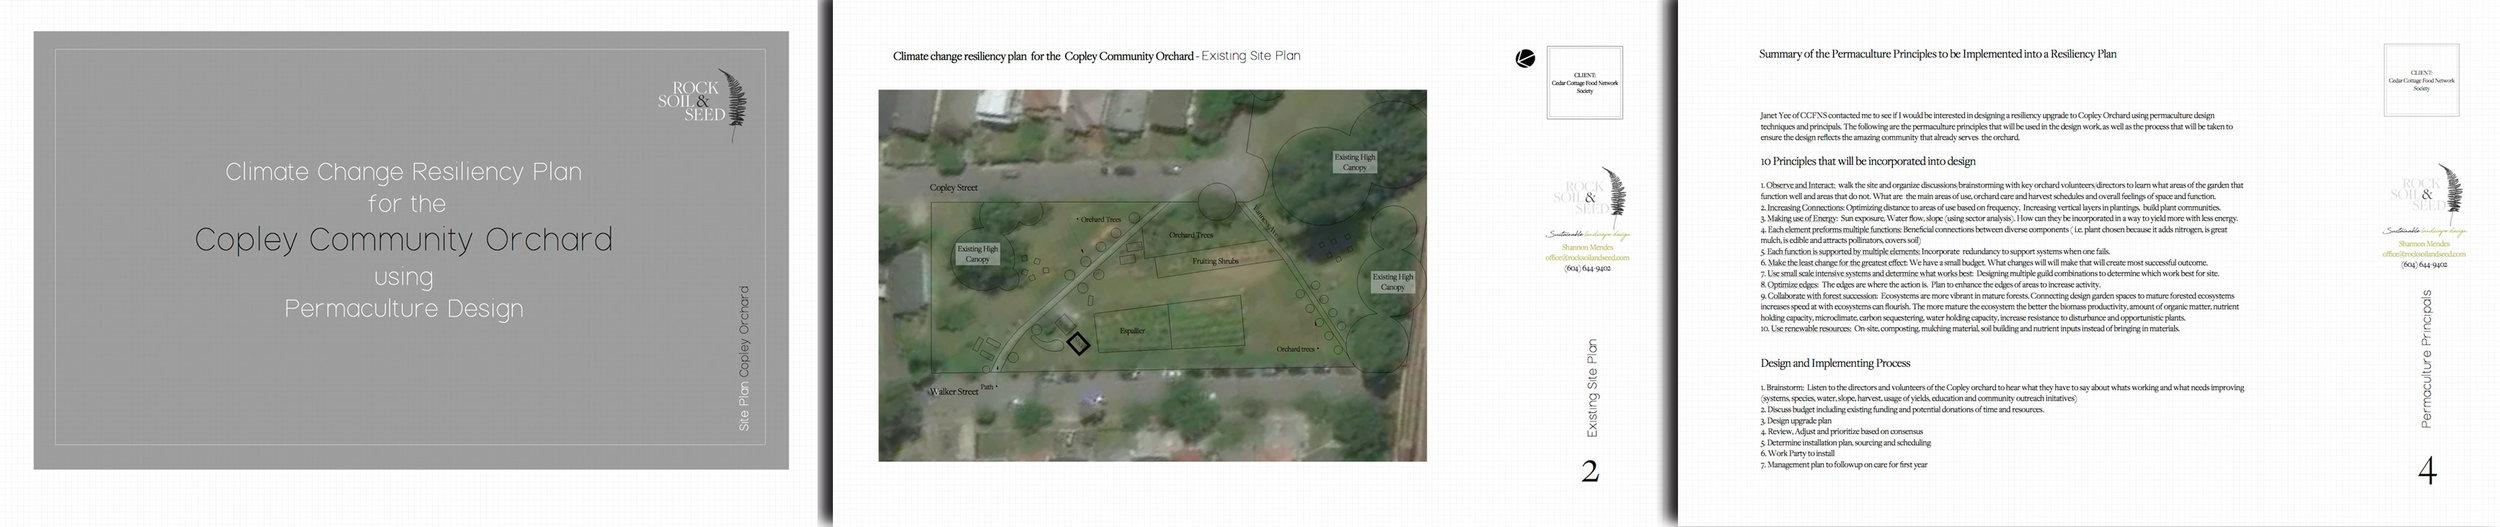 Copley-Orchard-web-1.jpg